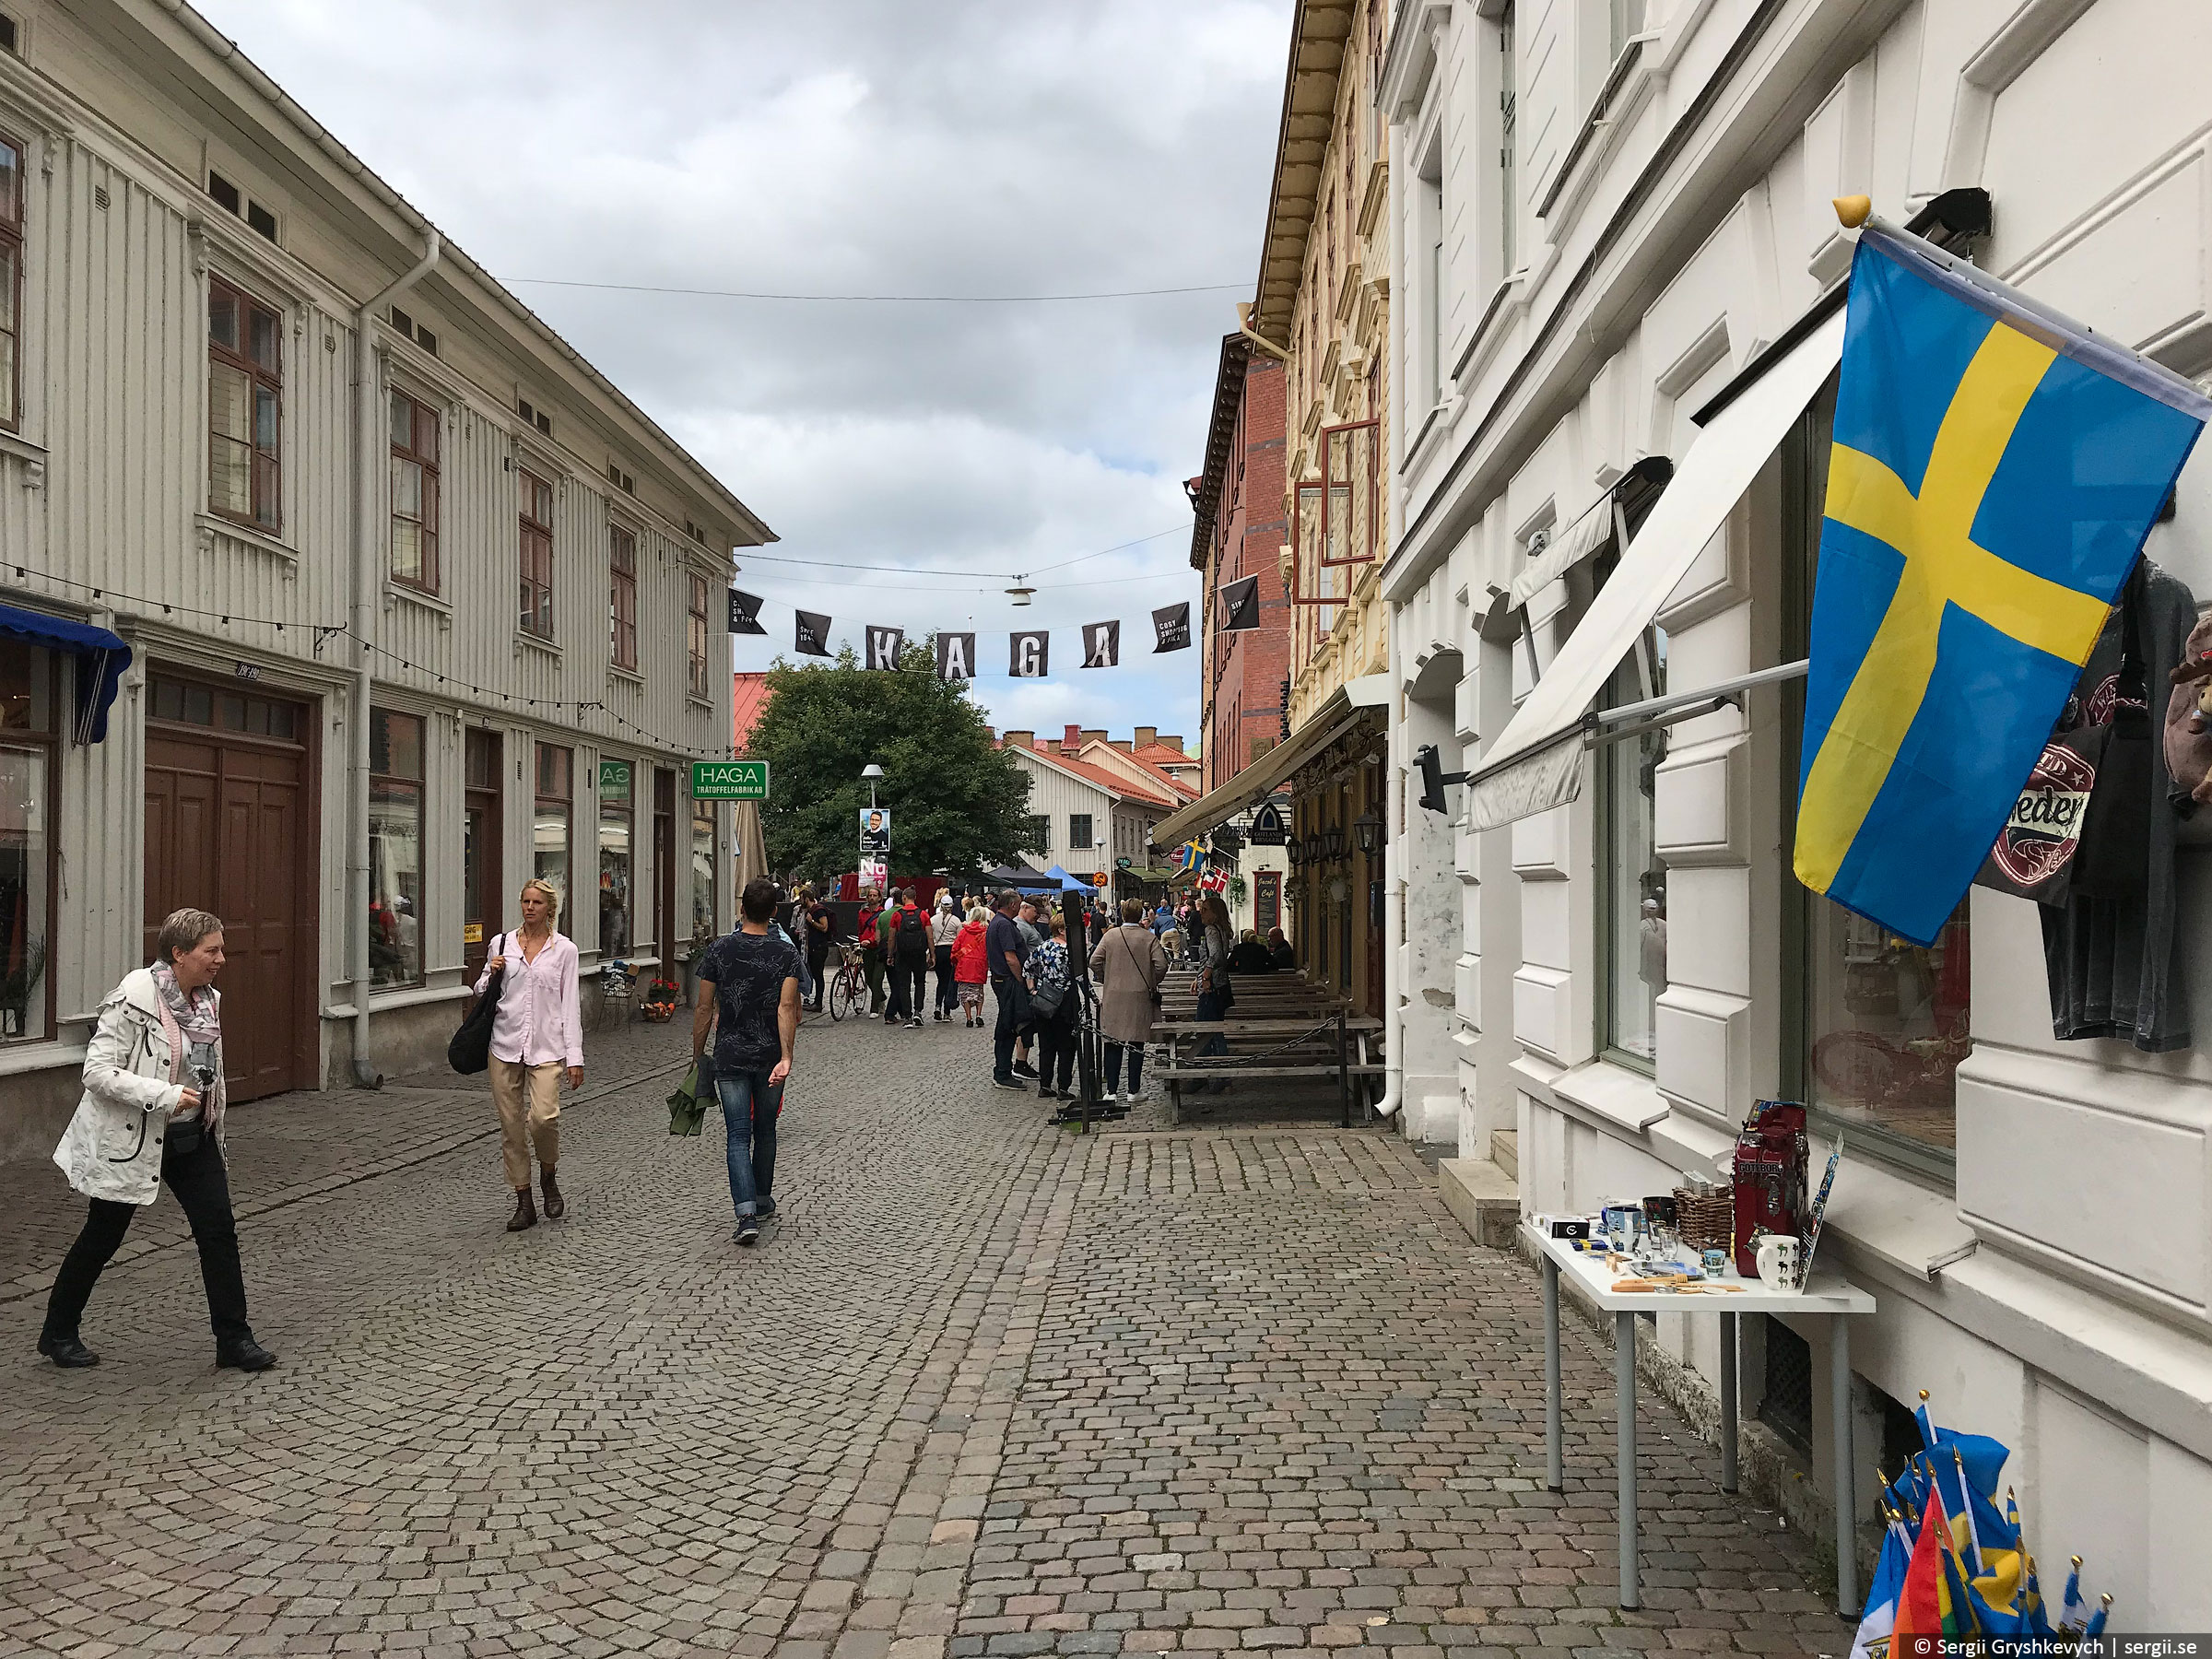 göteborg-ghotenburg-sweden-2018-42